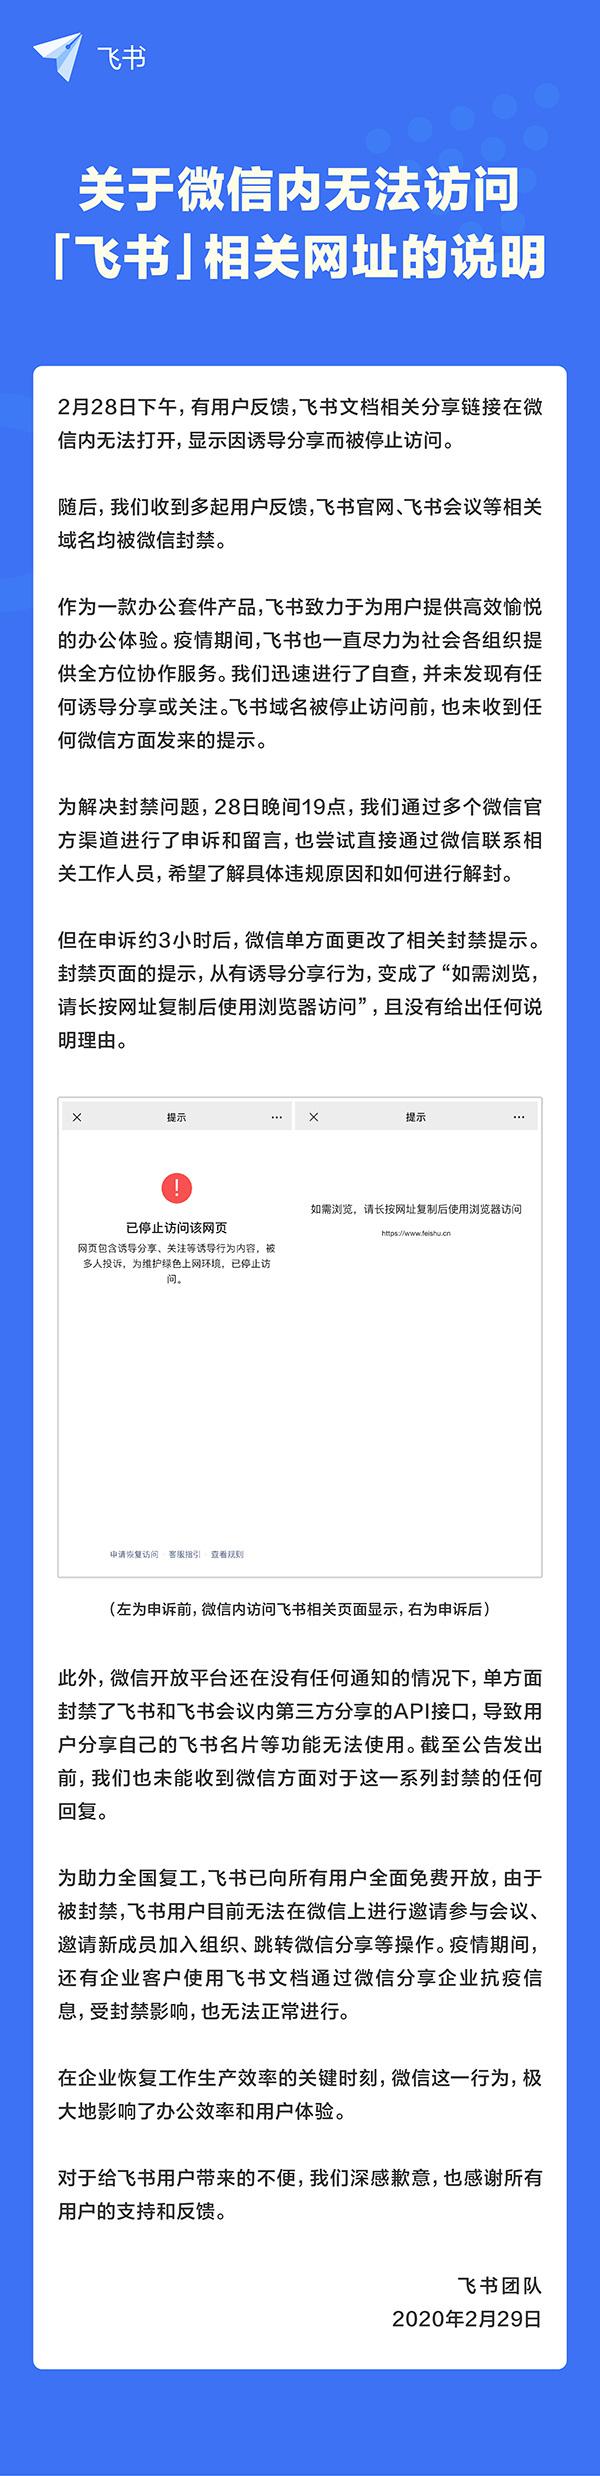 im体育:字节跳动称旗下办公产品飞书被微信全面封禁